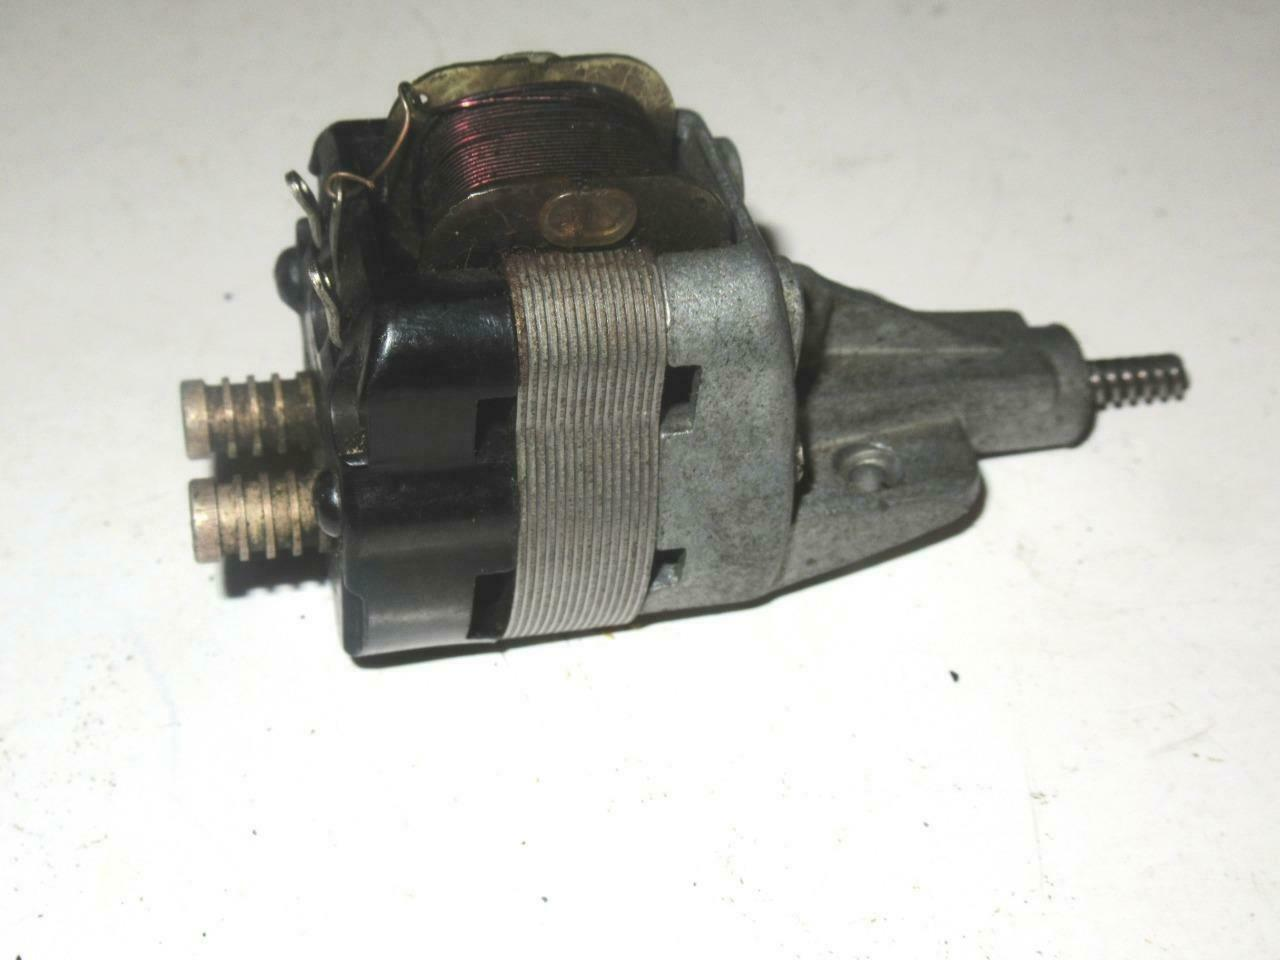 Lionel parte-Original de la posguerra - 726 Berkshire Motor-Excelentes-W12